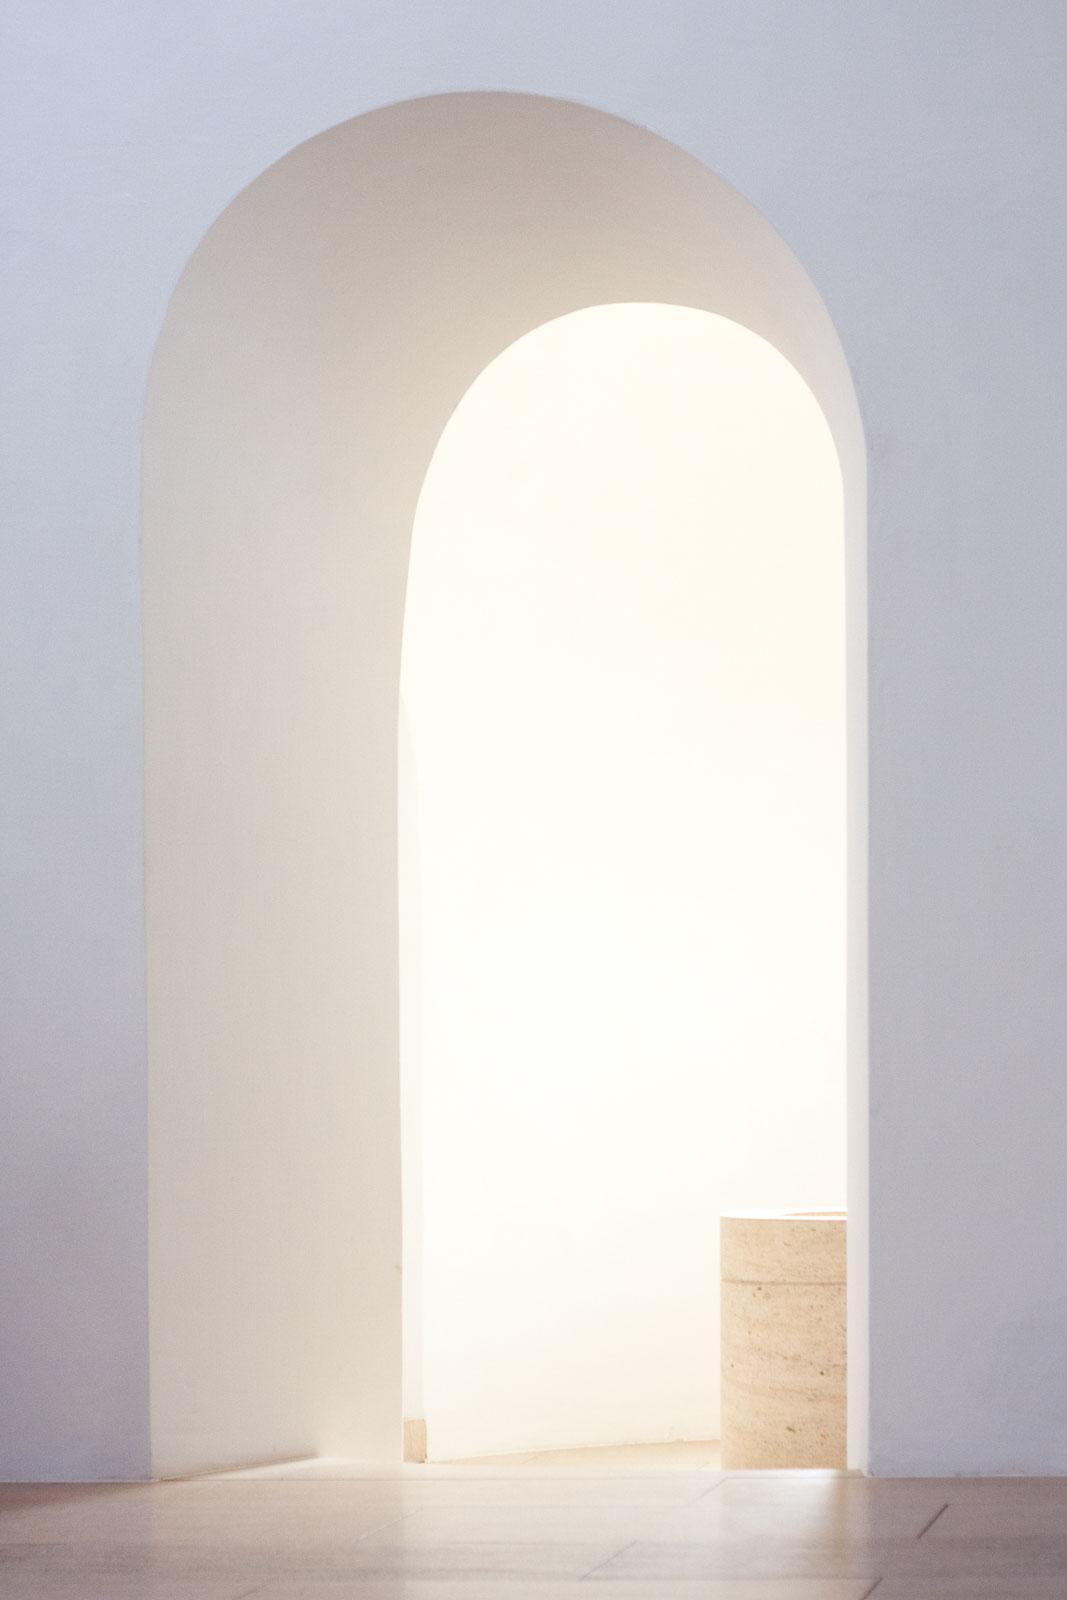 Moritzkirche-Augsburg-Andreas-Fuhrmann-0014